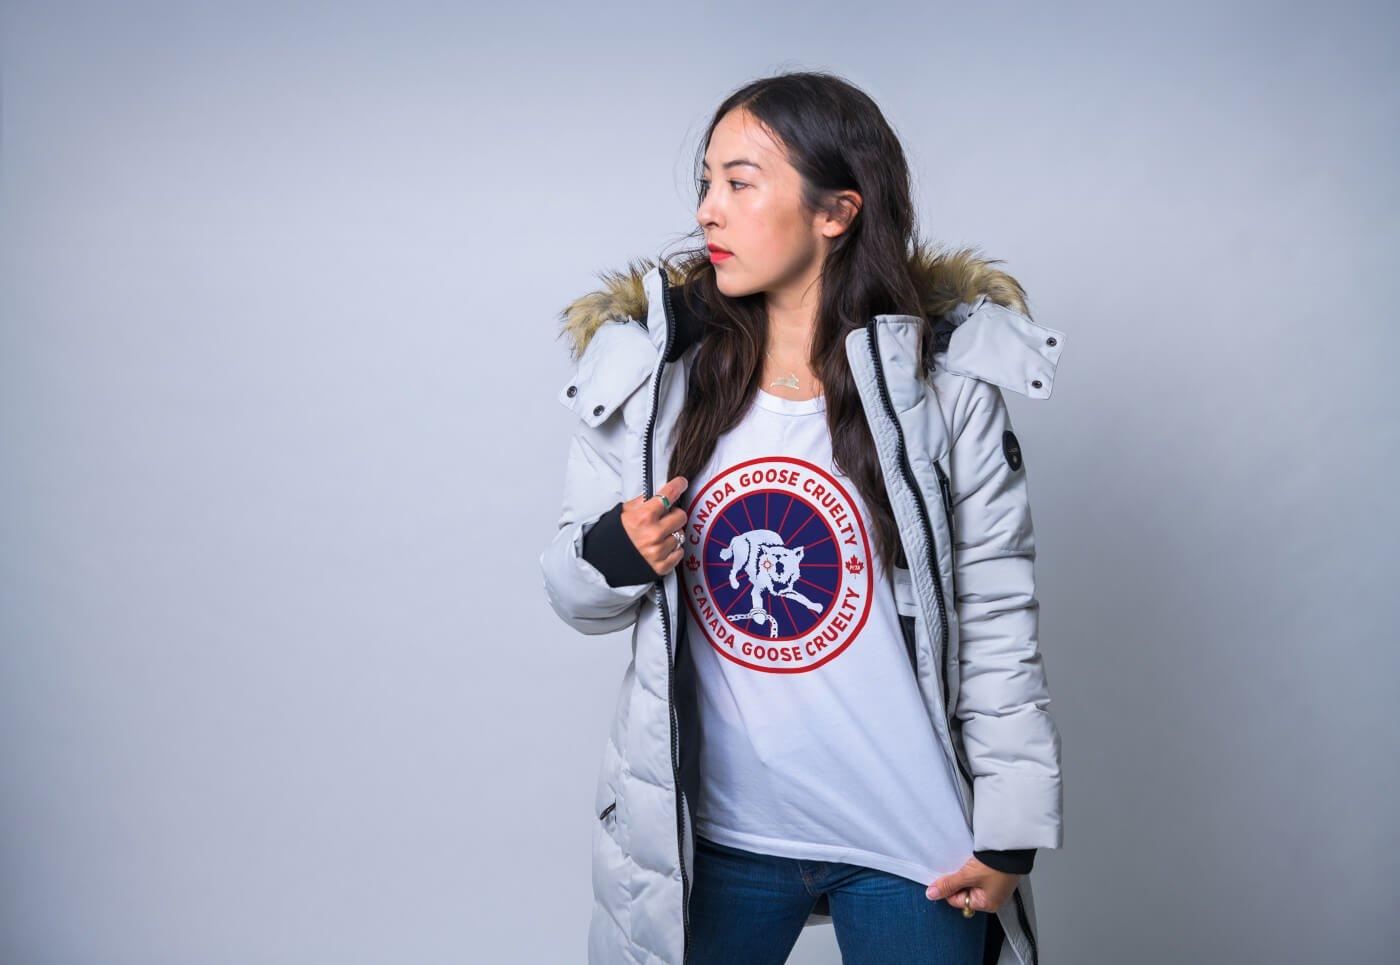 woman wearing a vegan winter coat wears a shirt protesting canada goose